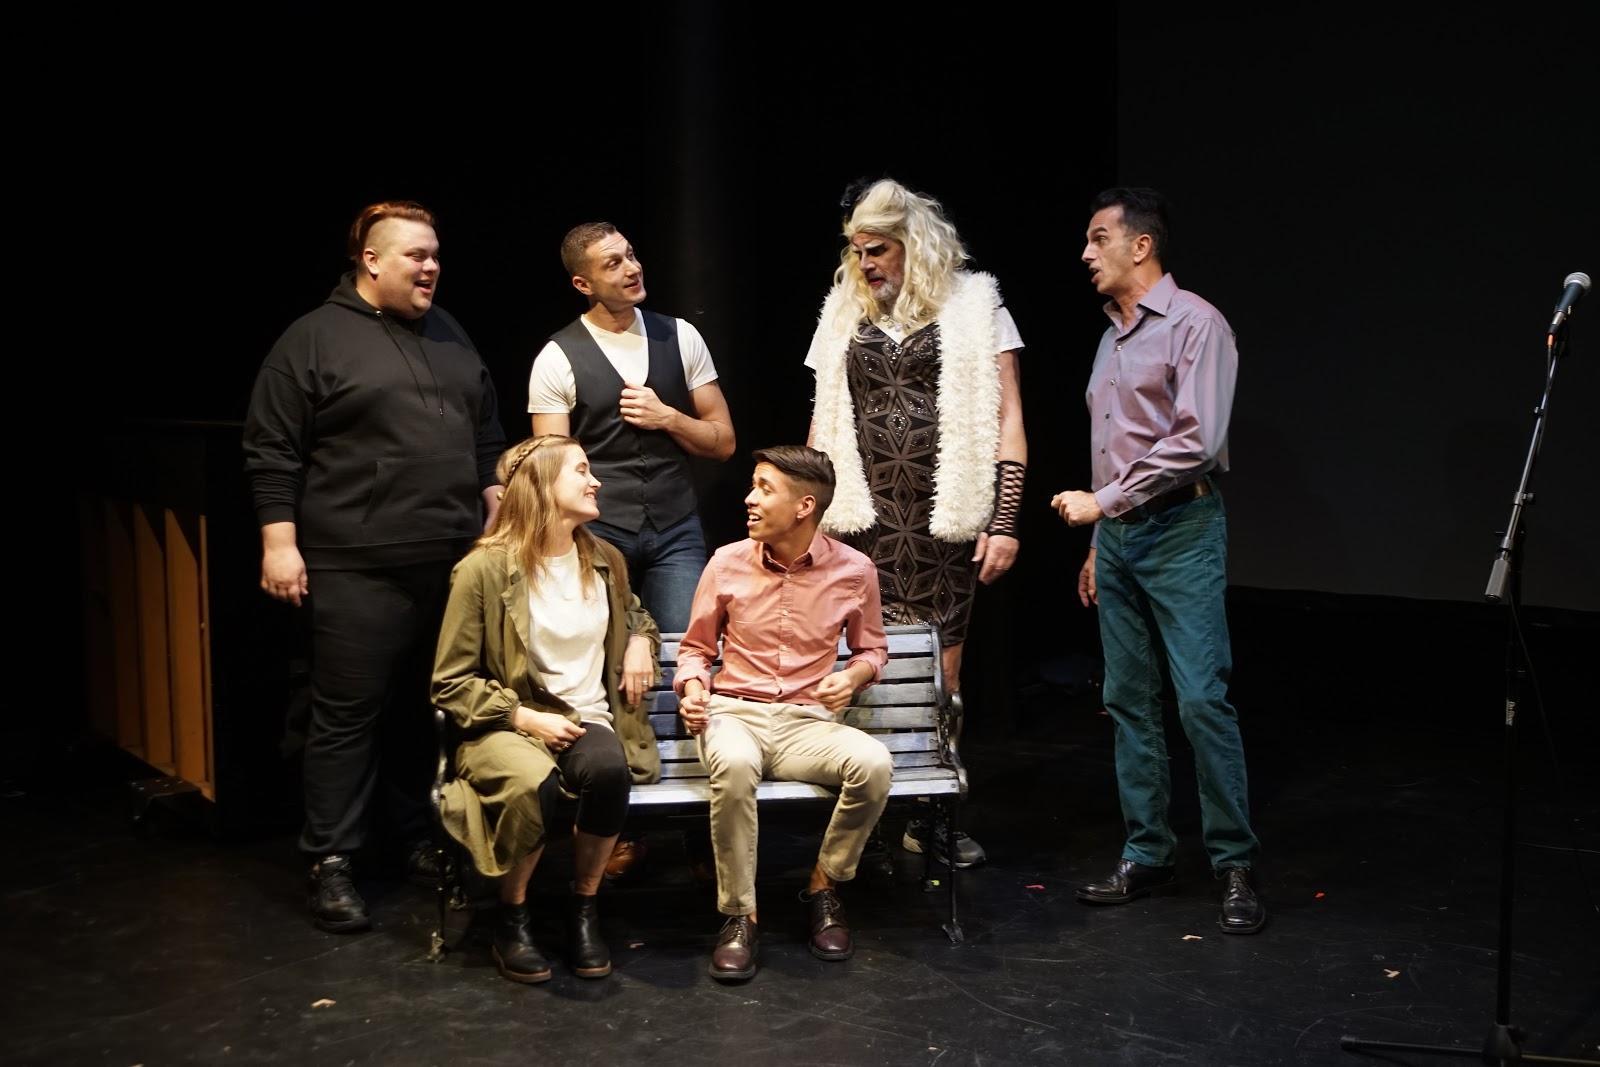 steinhardt s original production living with addresses the aids